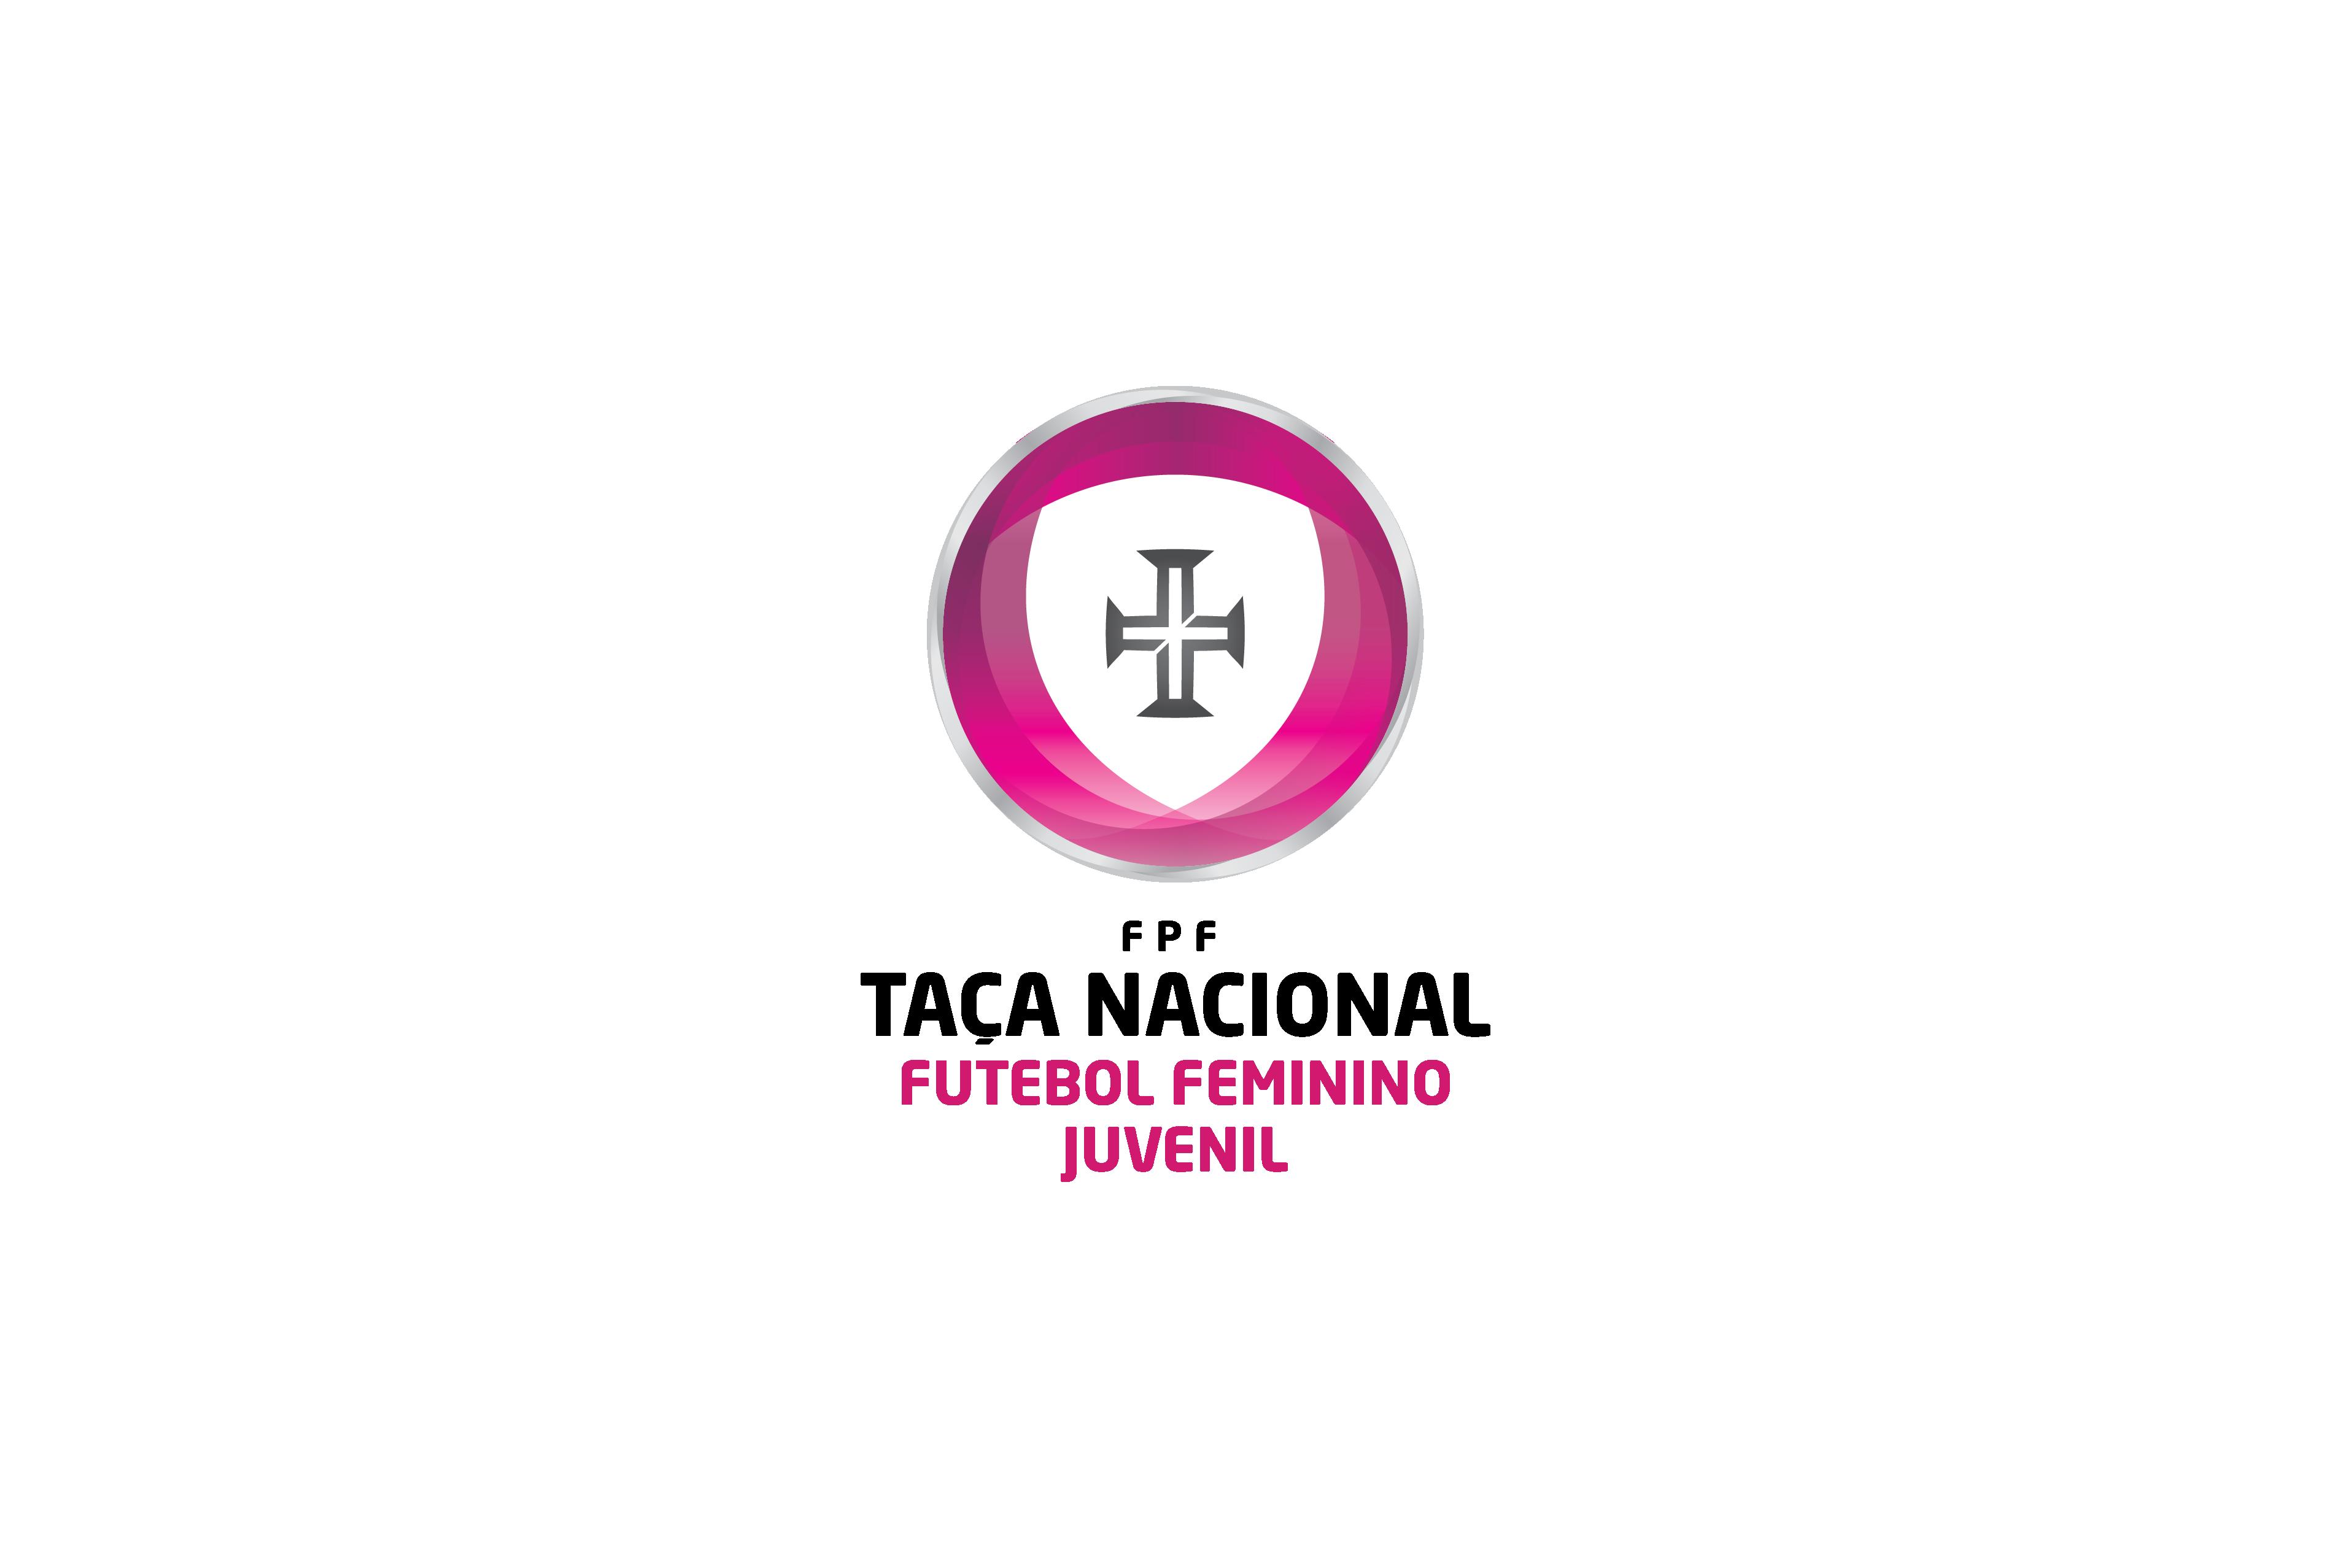 Taca_Nacional_Futebol_Fem_Juvenil_vv (1)